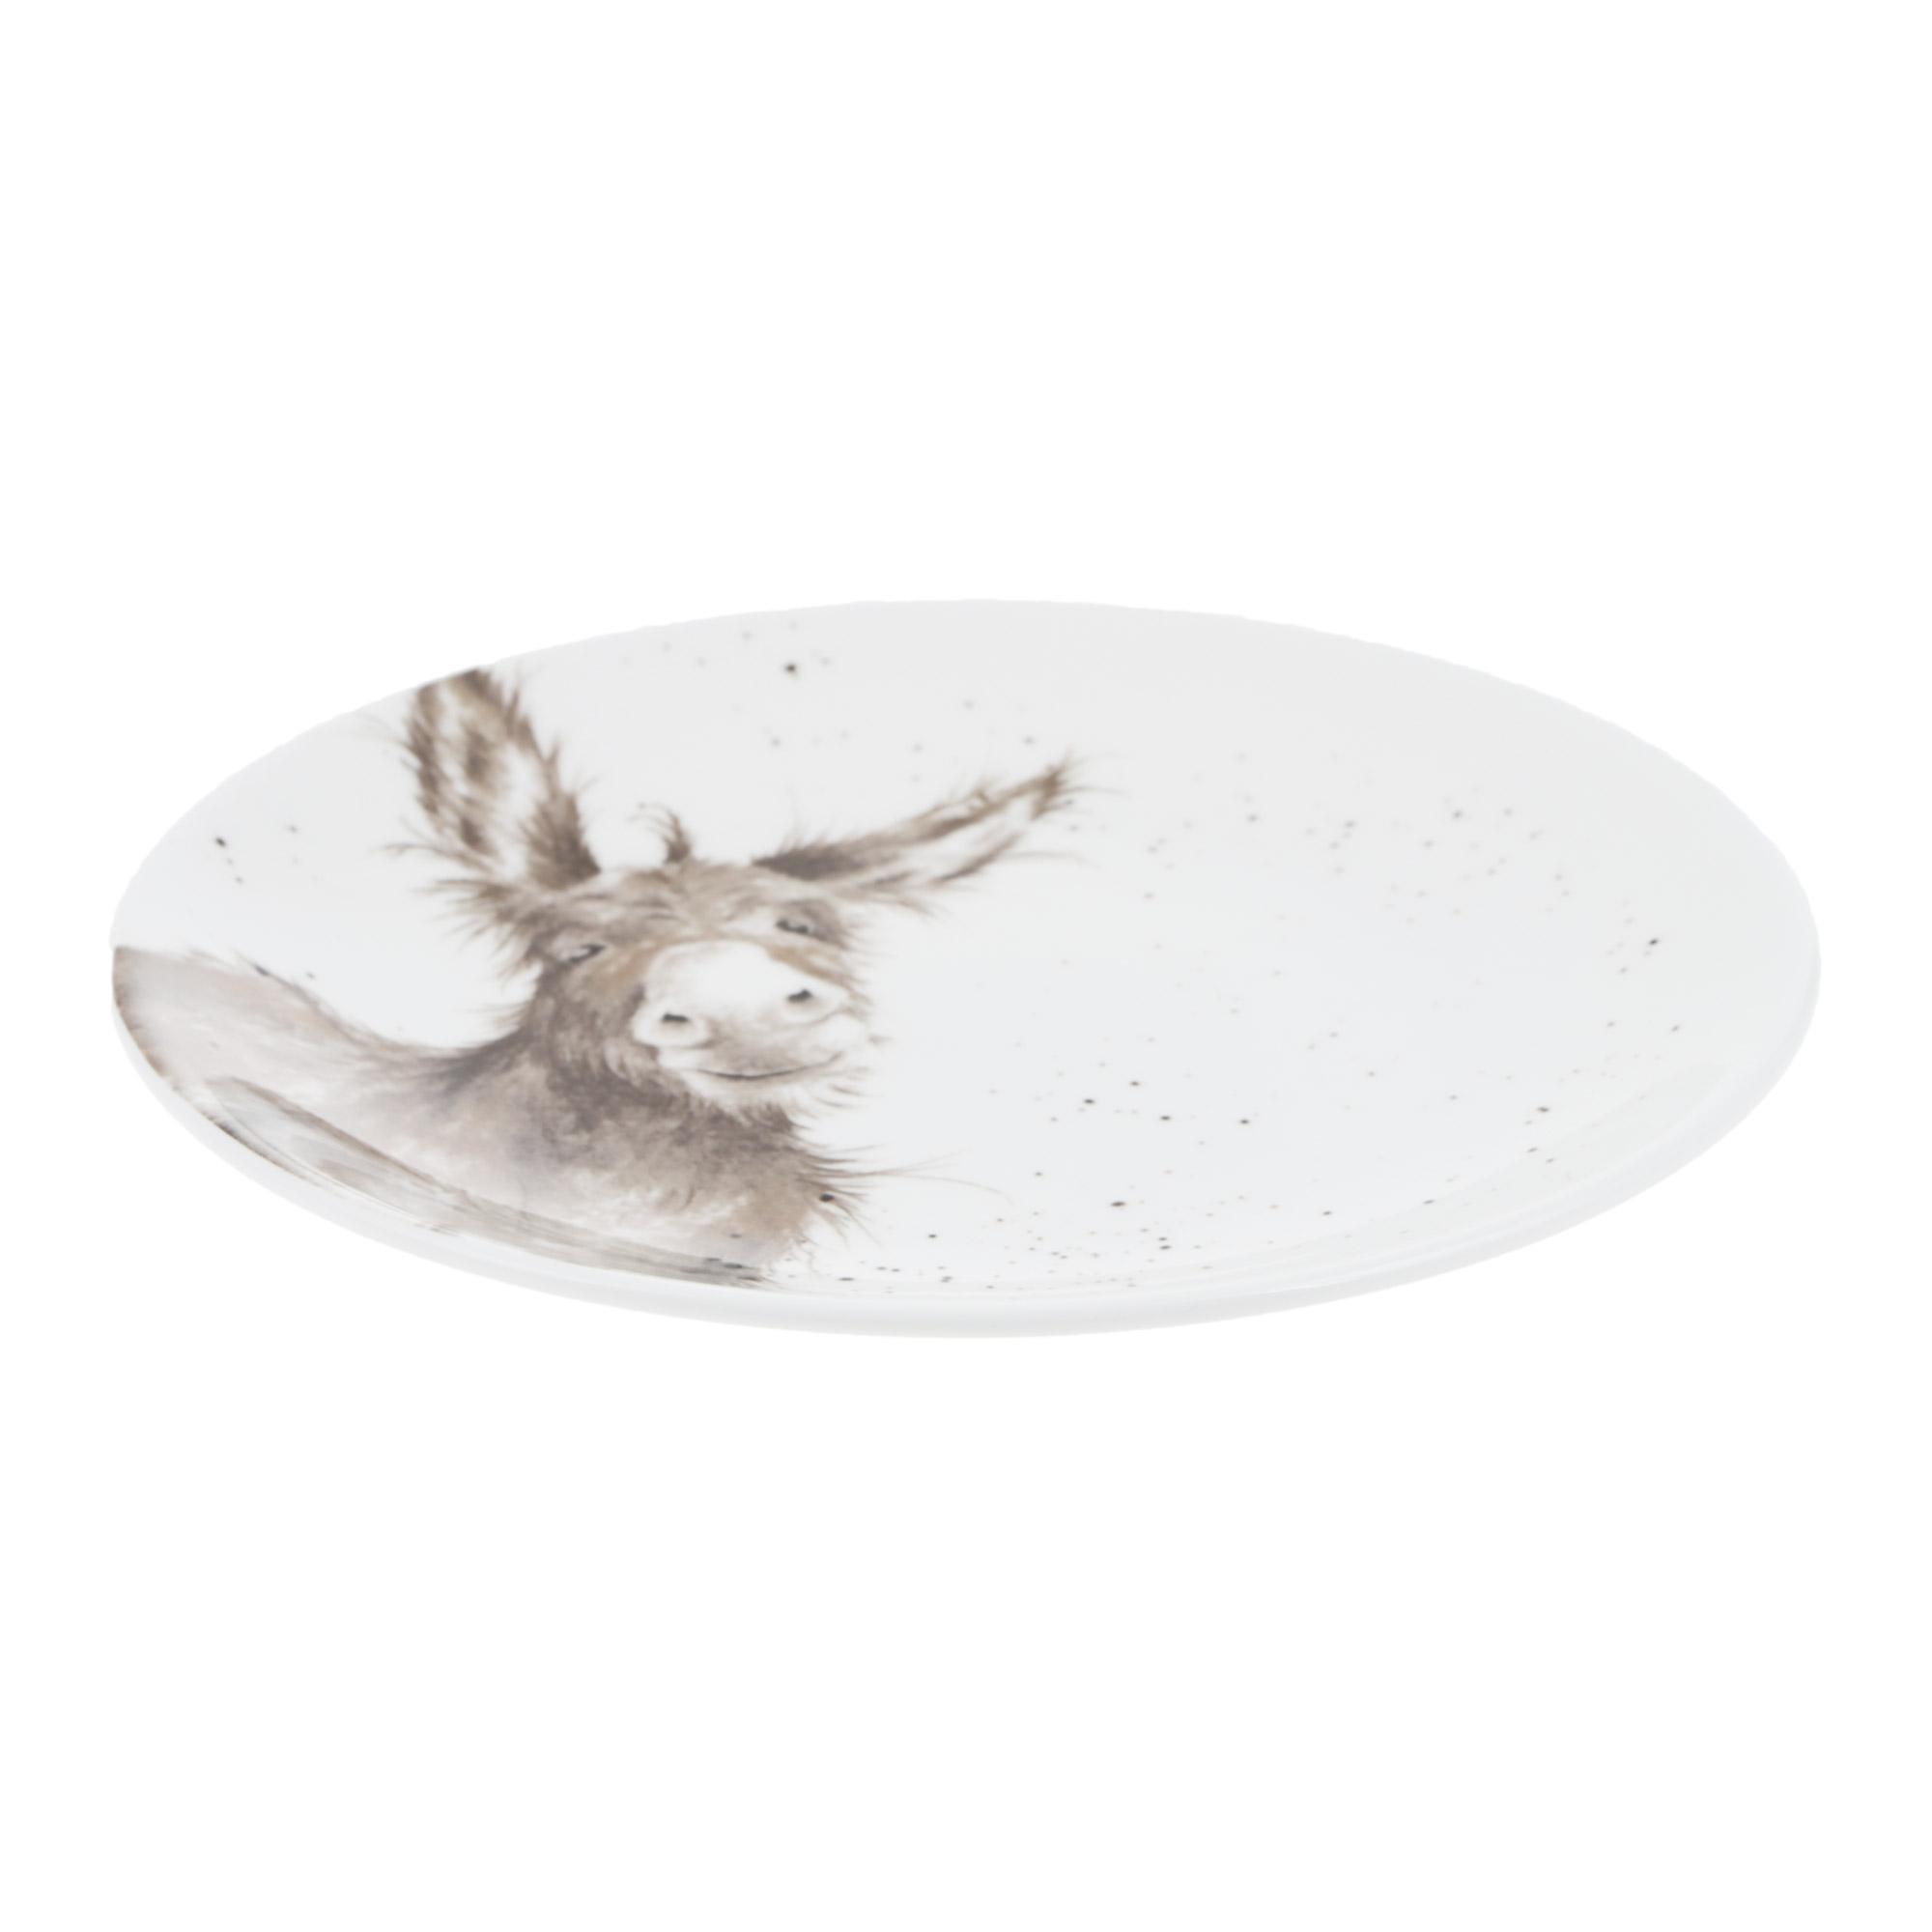 Тарелка десертная 16,5см Royal Worcester забавная фауна ослик фото